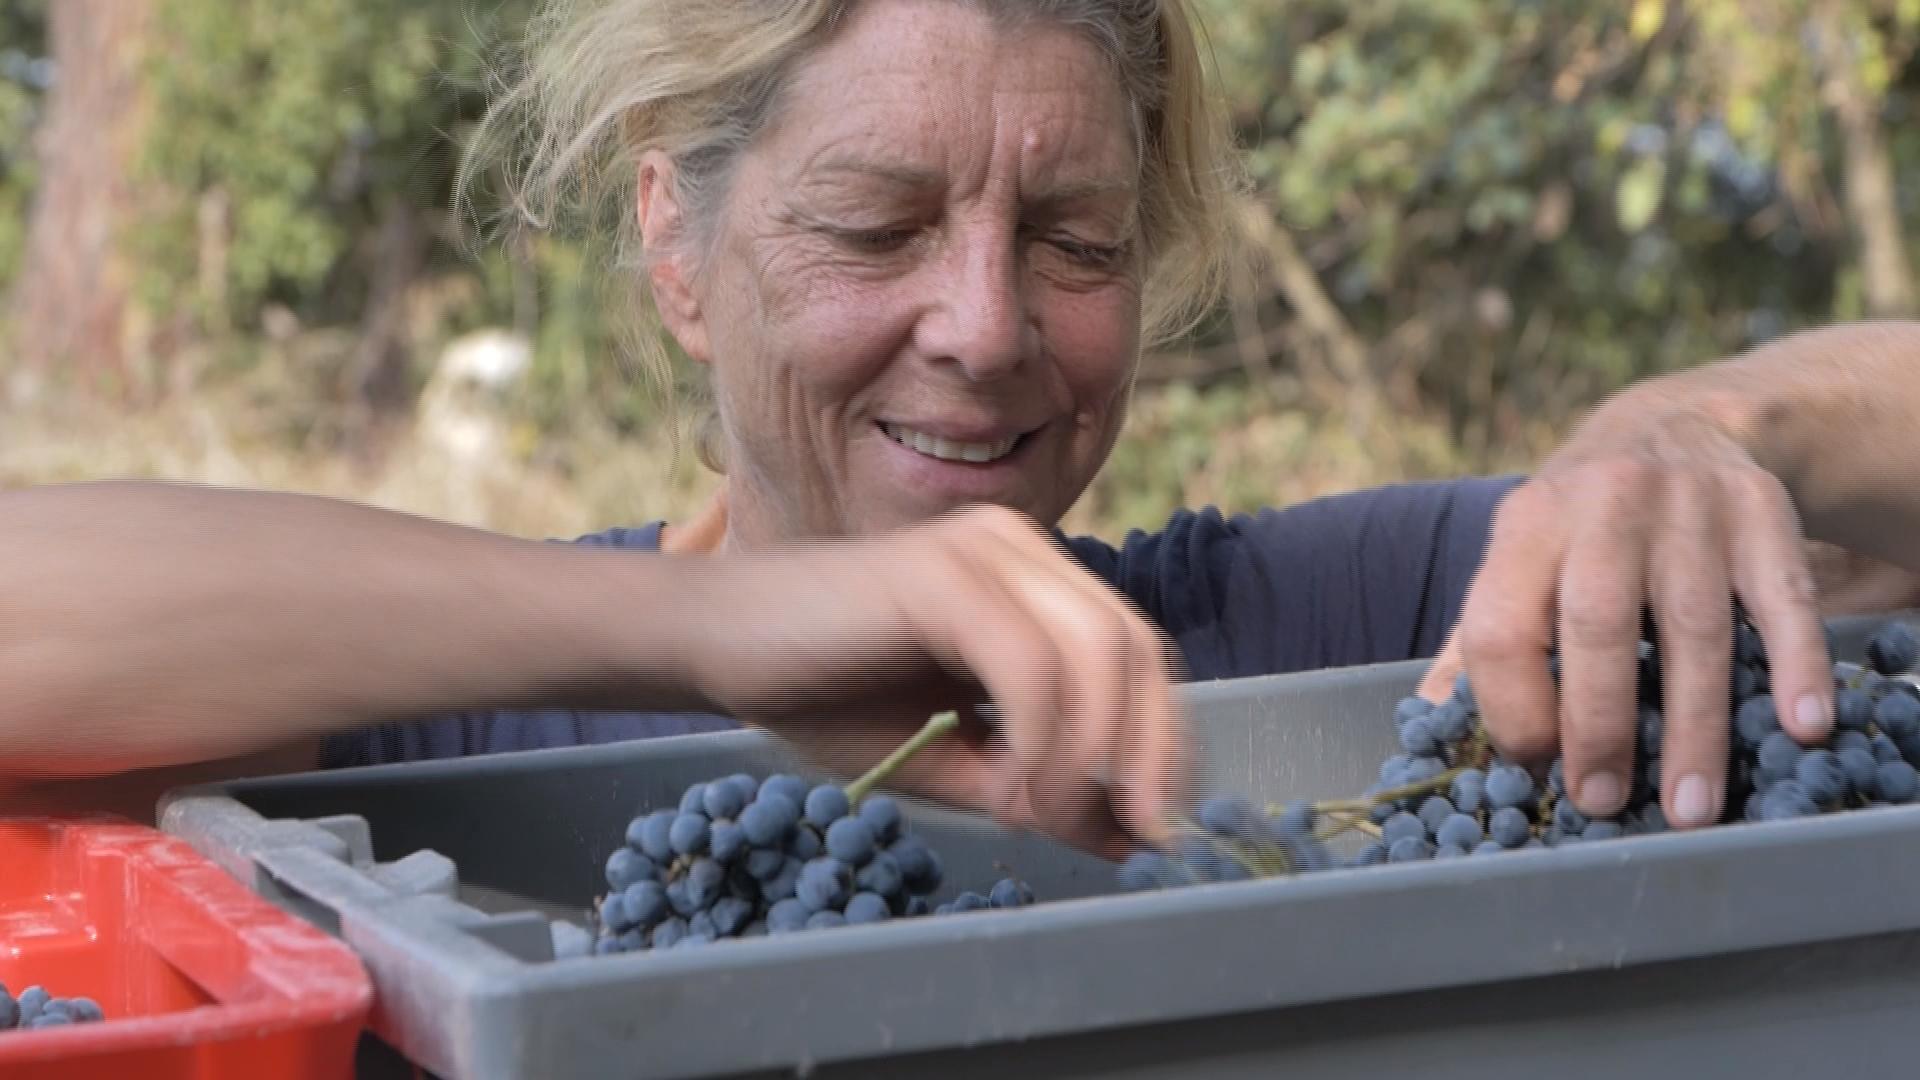 The 51 percent - women in wine